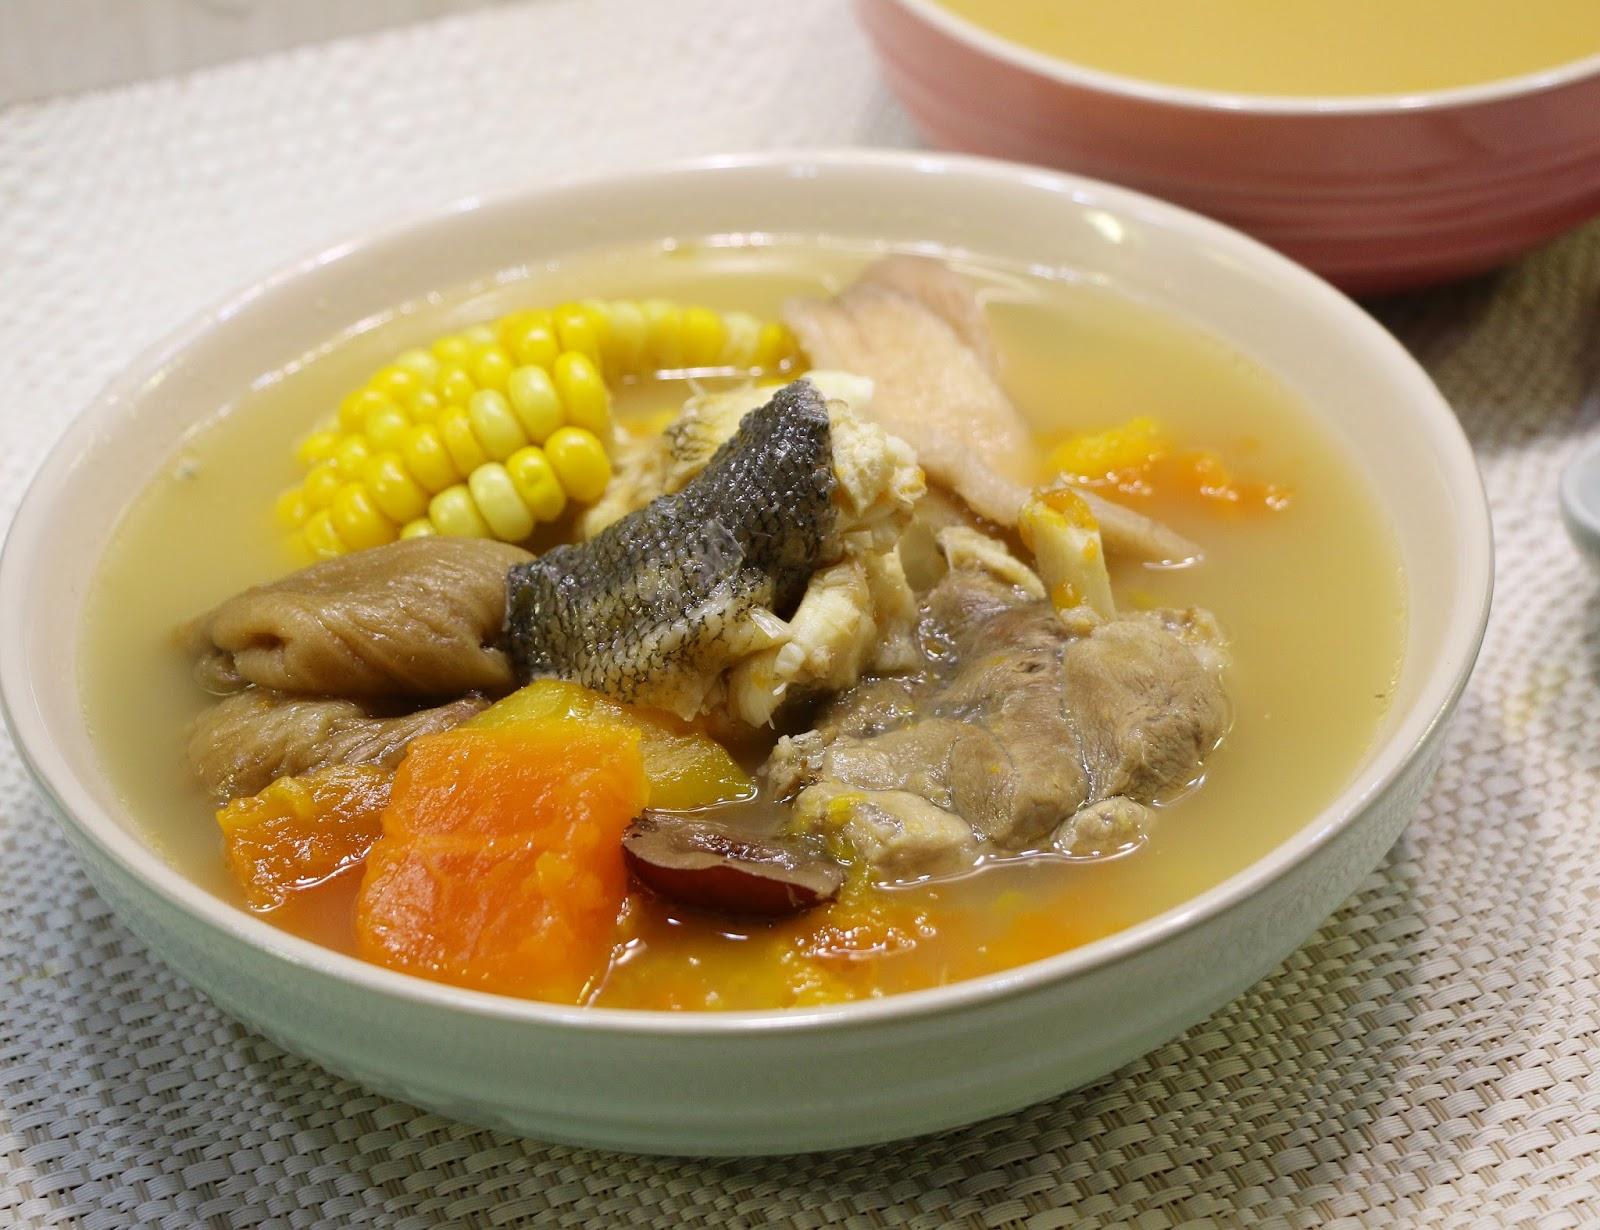 Fen's Cooking: 牛鰍魚木瓜紅棗淮山湯